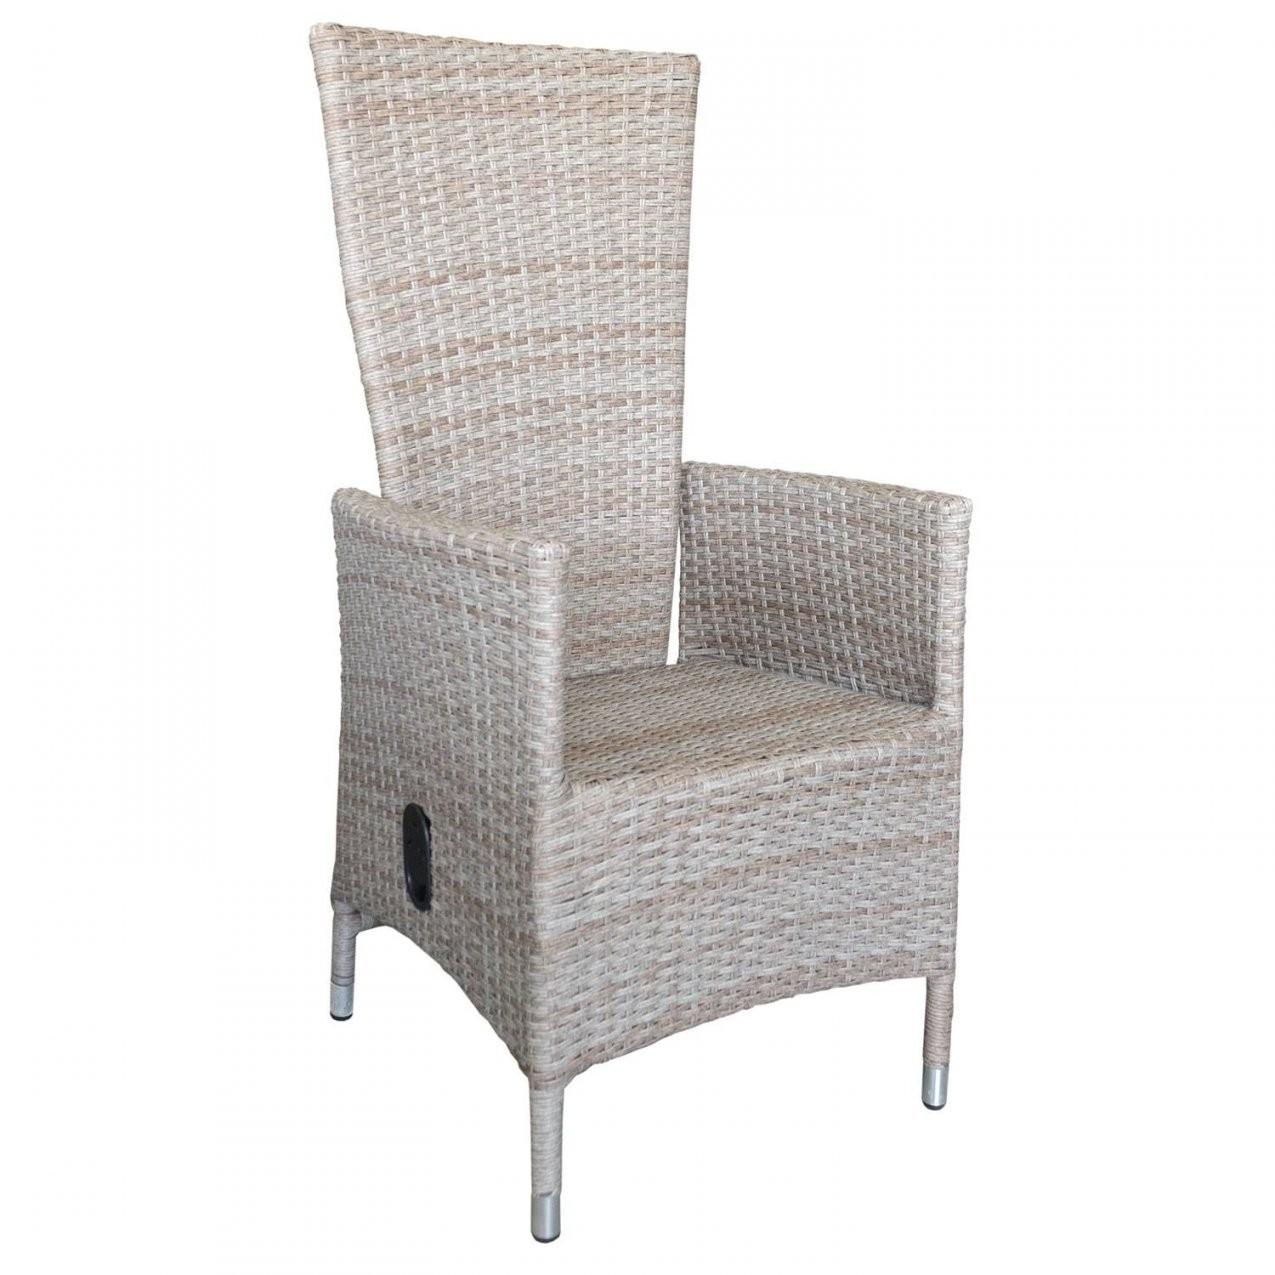 Polyrattan Sessel Lea Natur Stufenlos Verstellbare Rückenlehne Von von Polyrattan Sessel Verstellbarer Rückenlehne Bild